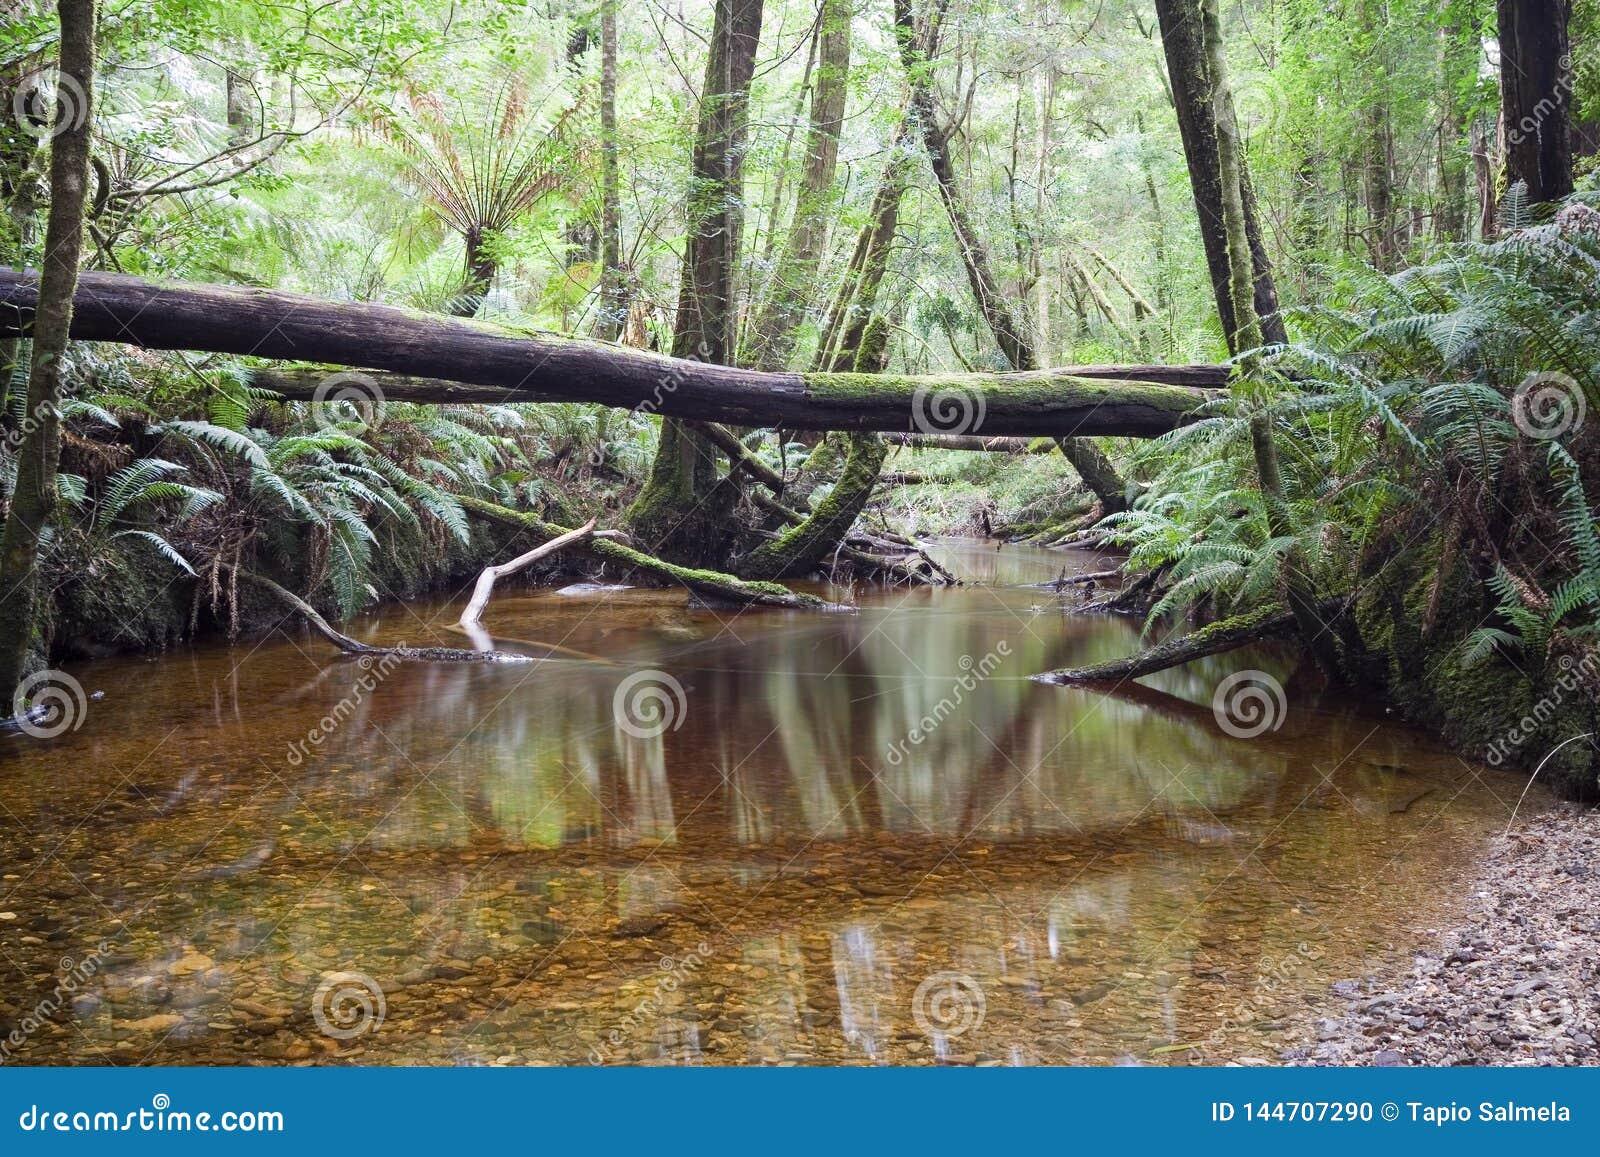 Forest of Tranquility - Australian Rainforest Sanctuary